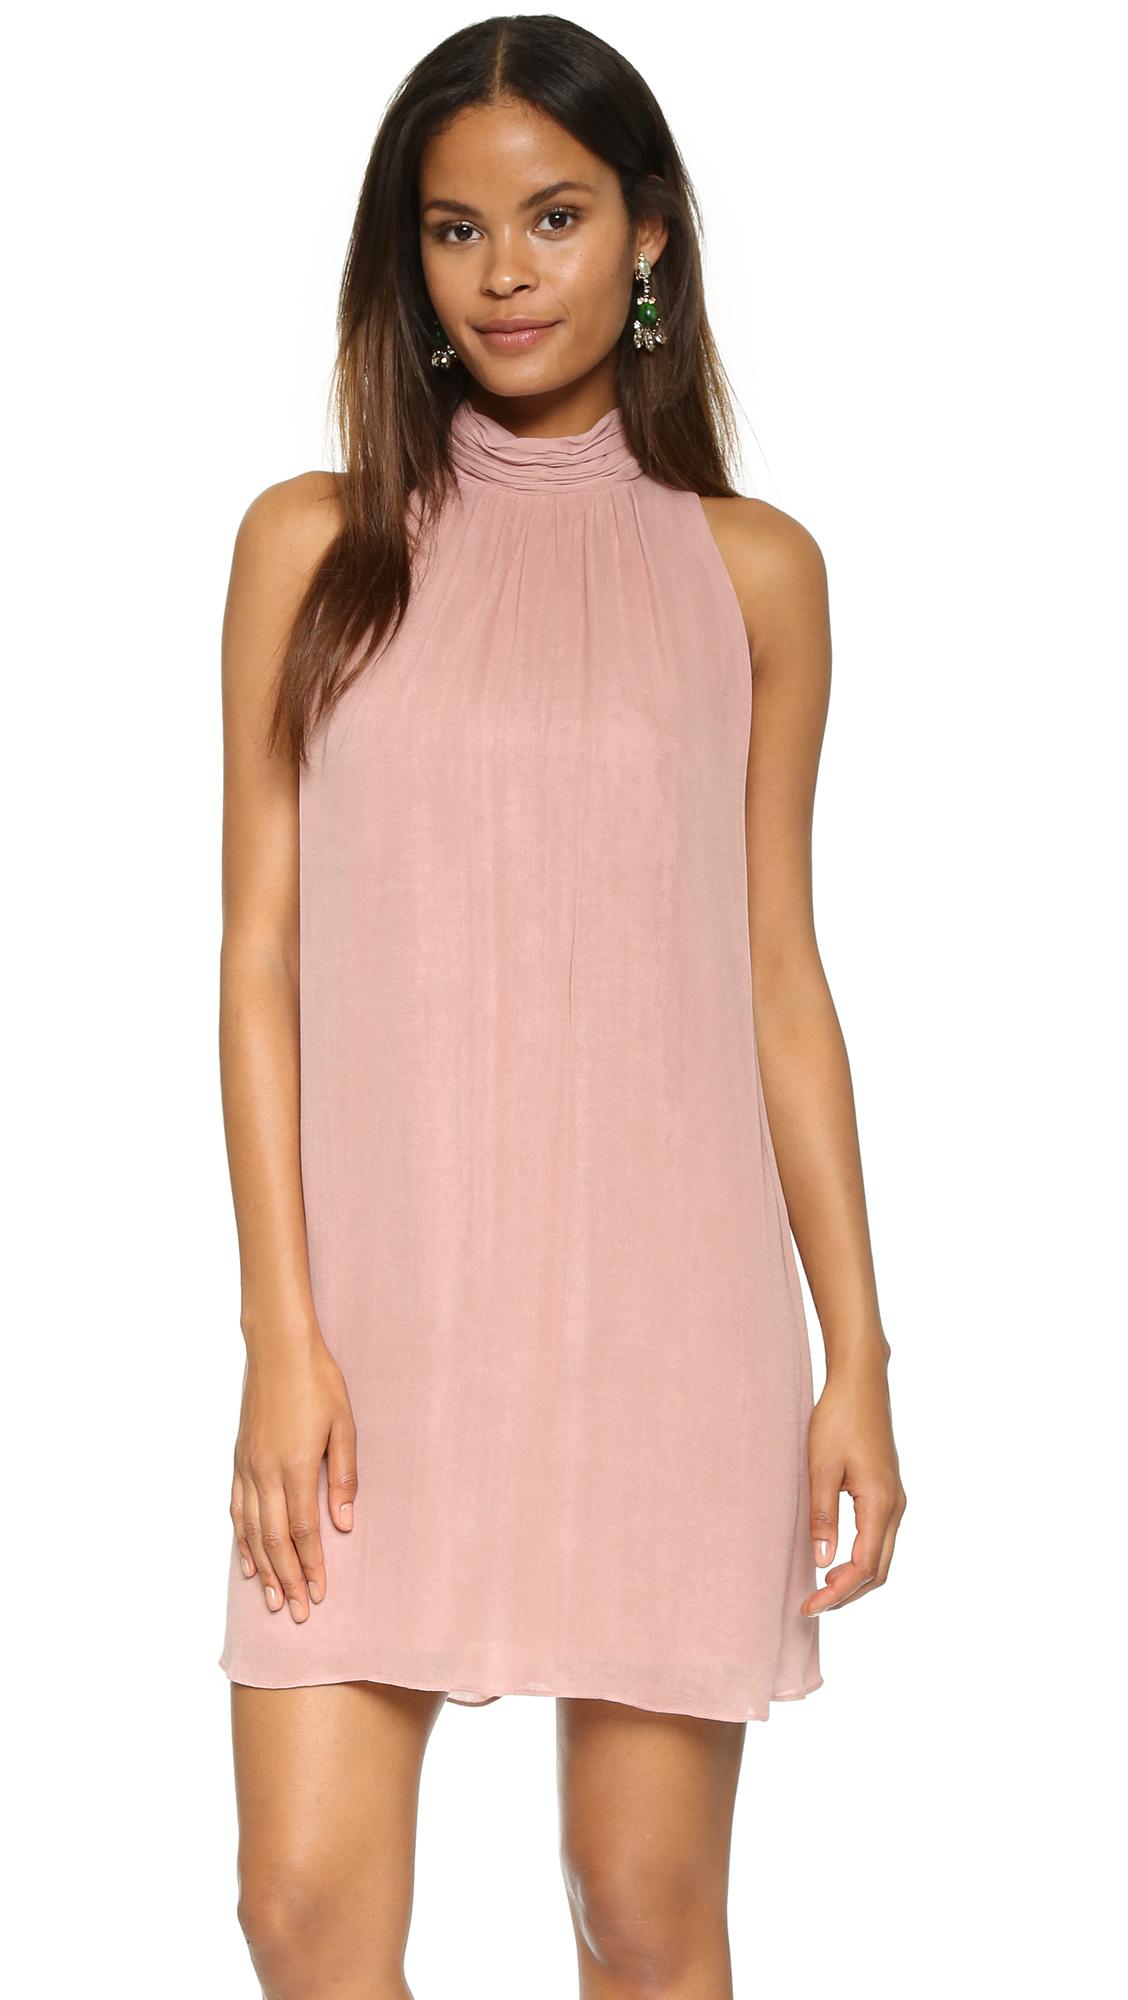 Alice + Olivia Rhiannon Dress - Pale Blush at Shopbop